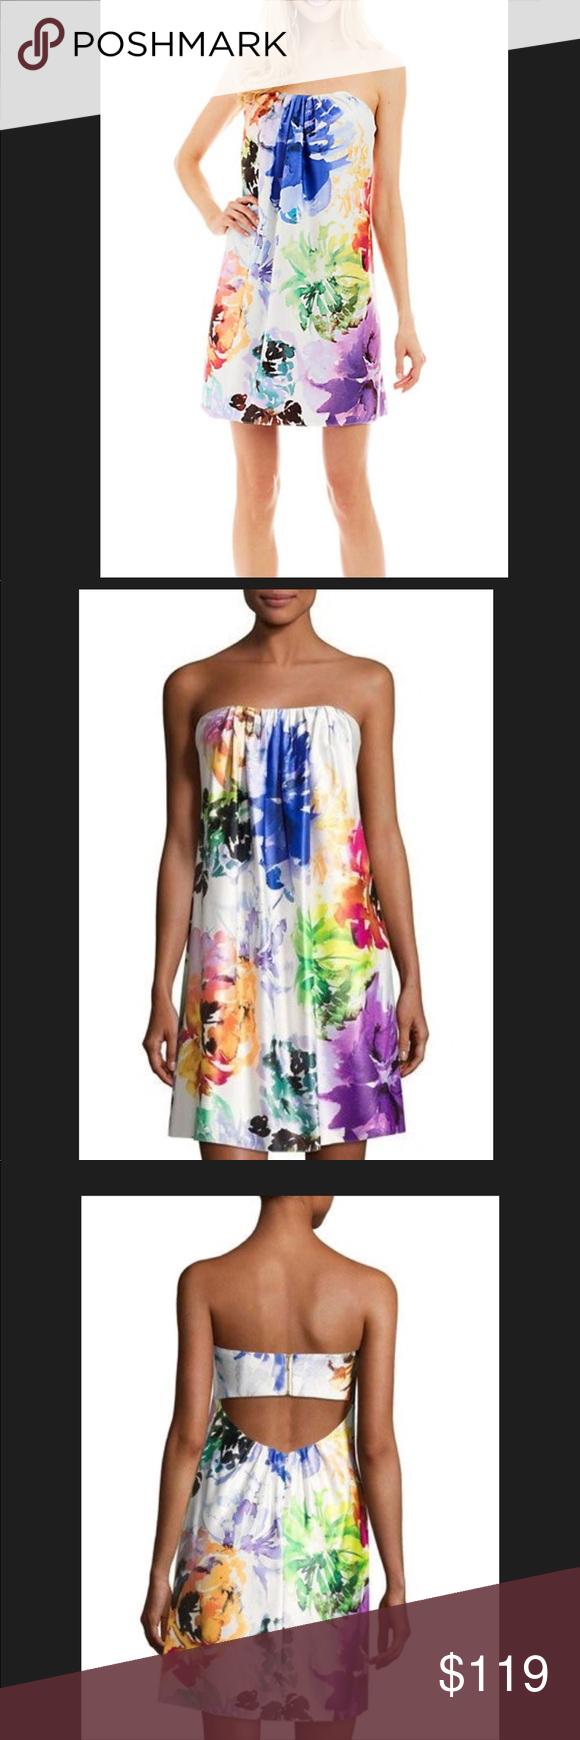 79015951ab59 NICOLE Miller Strapless Floral Dress BNWT Nicole miller Nicole Miller New  York Floral Short Strapless Dress •Pleated strapless neckline; back cutout.